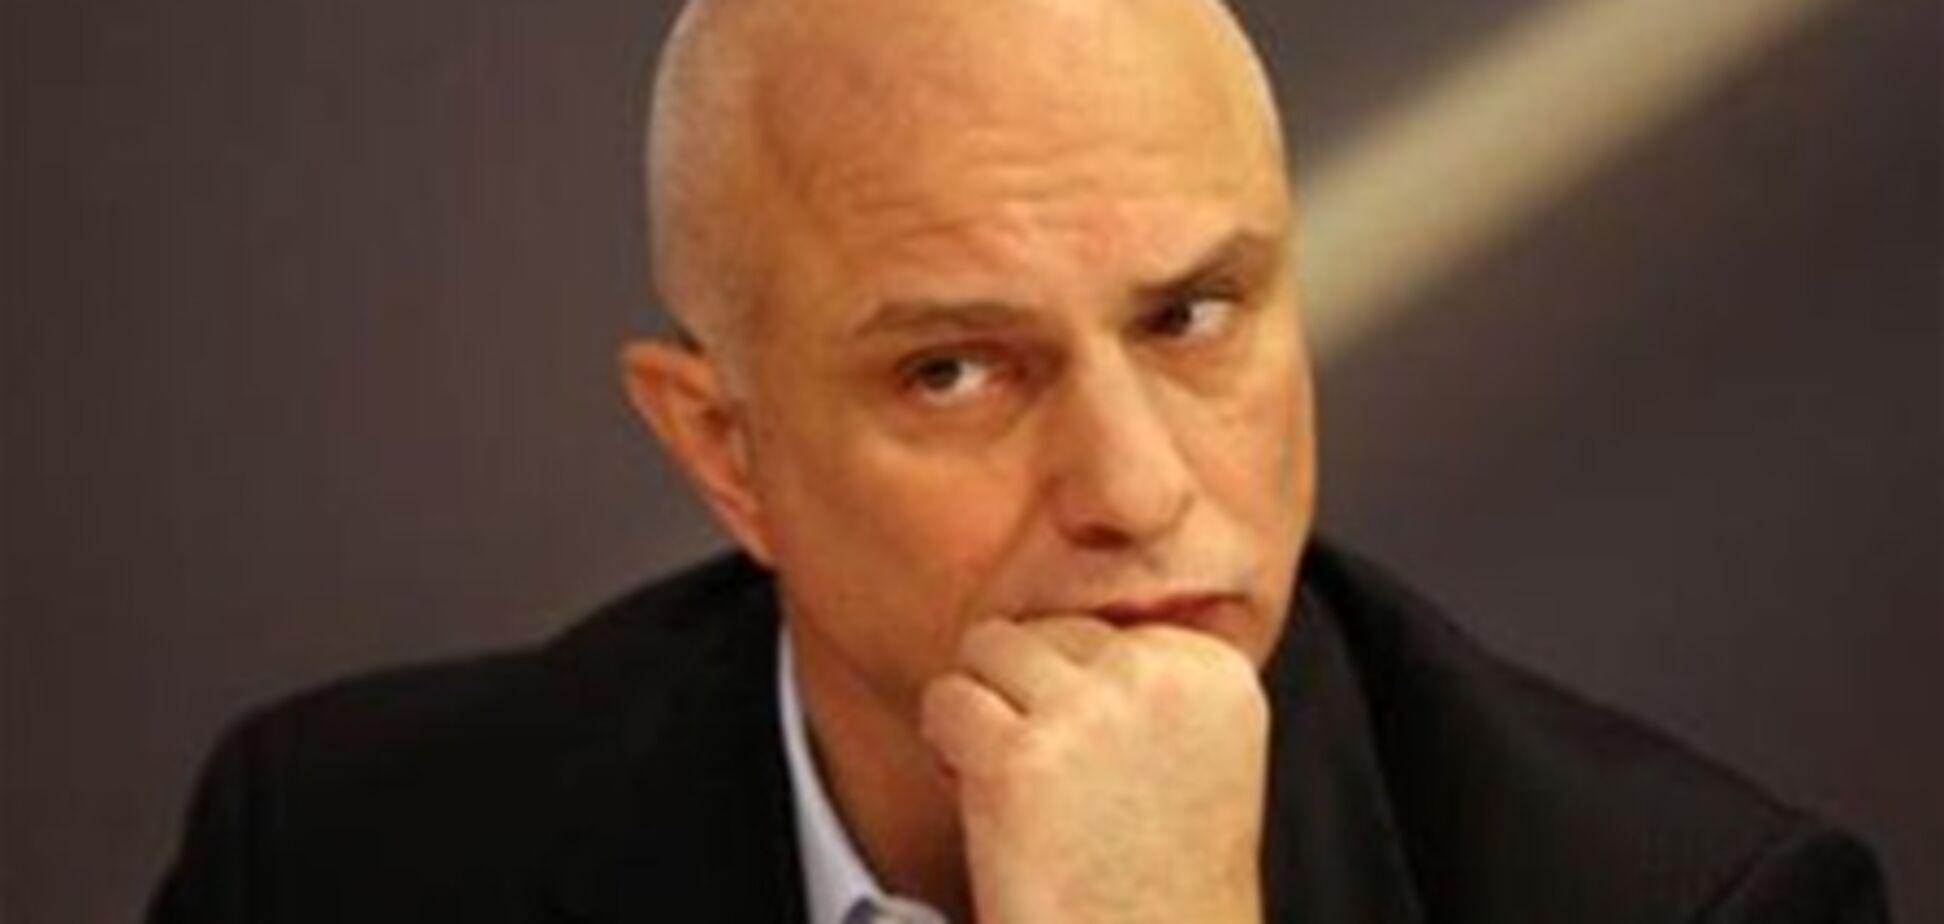 Муж Тимошенко: жену обвинили в убийстве из-за саммита Украина-ЕС